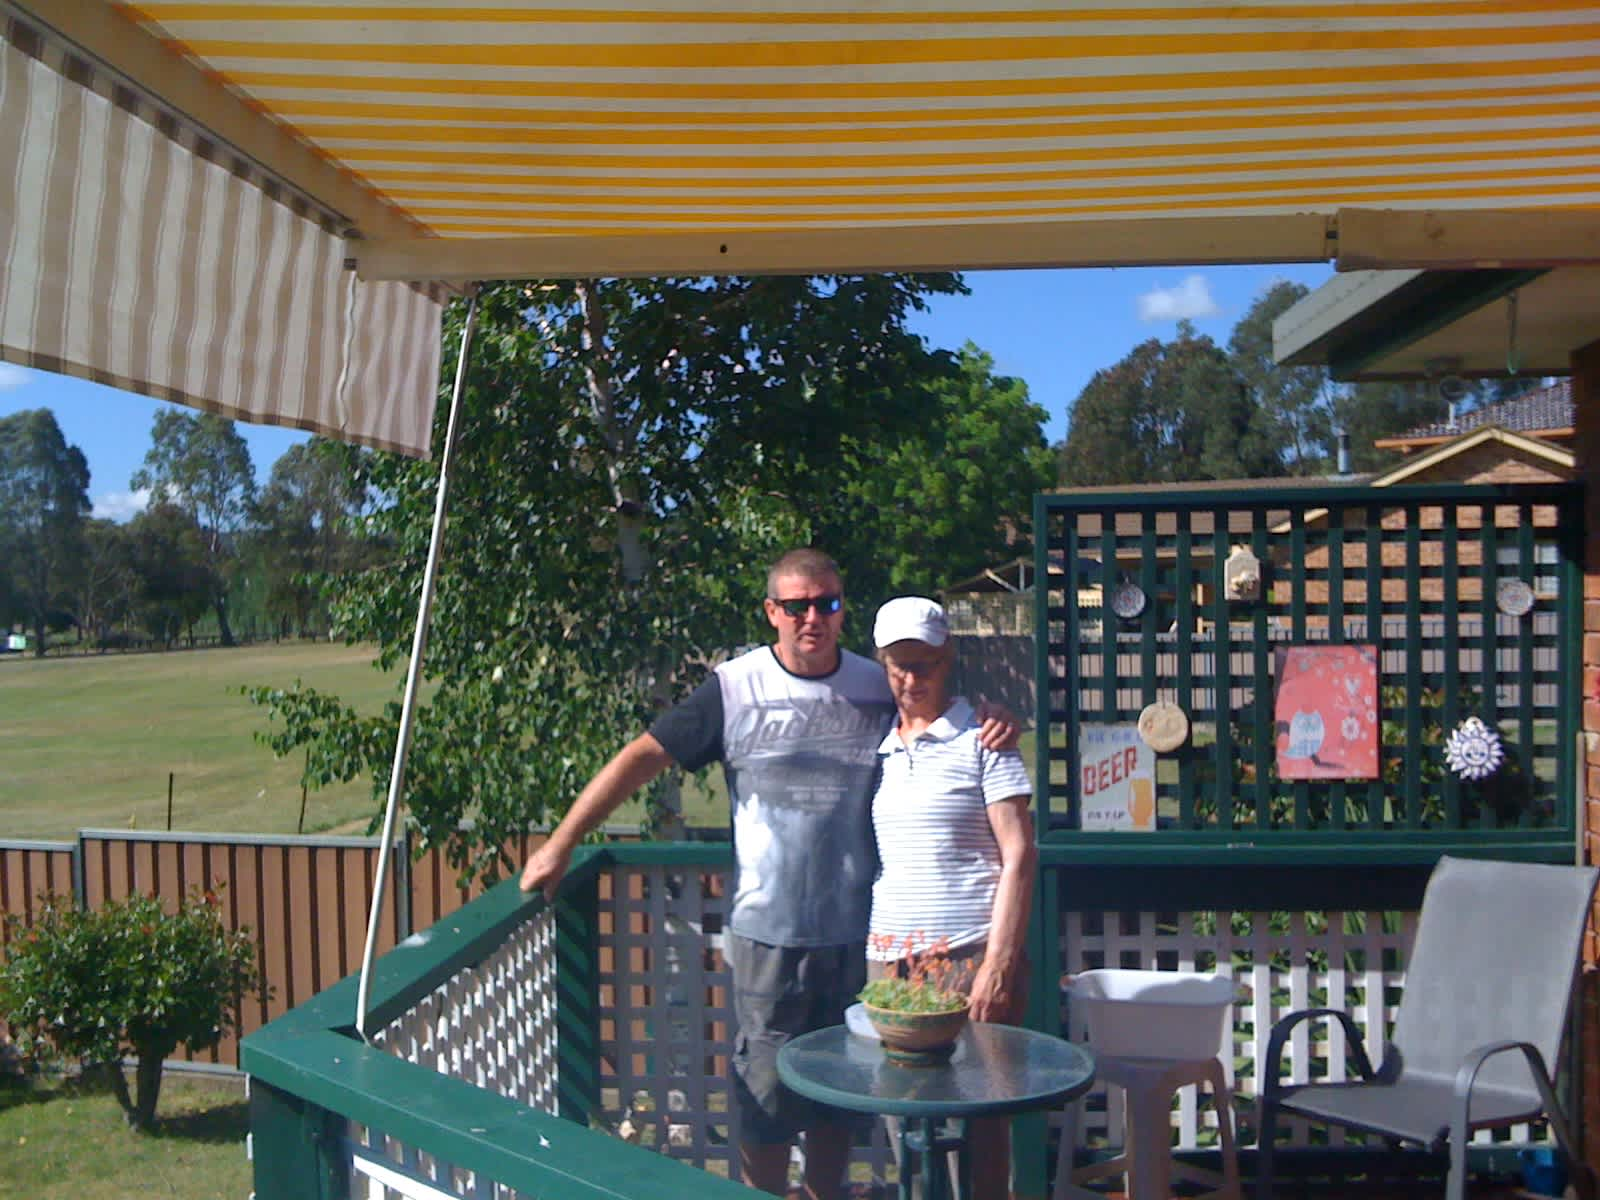 James & Violet from Wallerawang, New South Wales, Australia